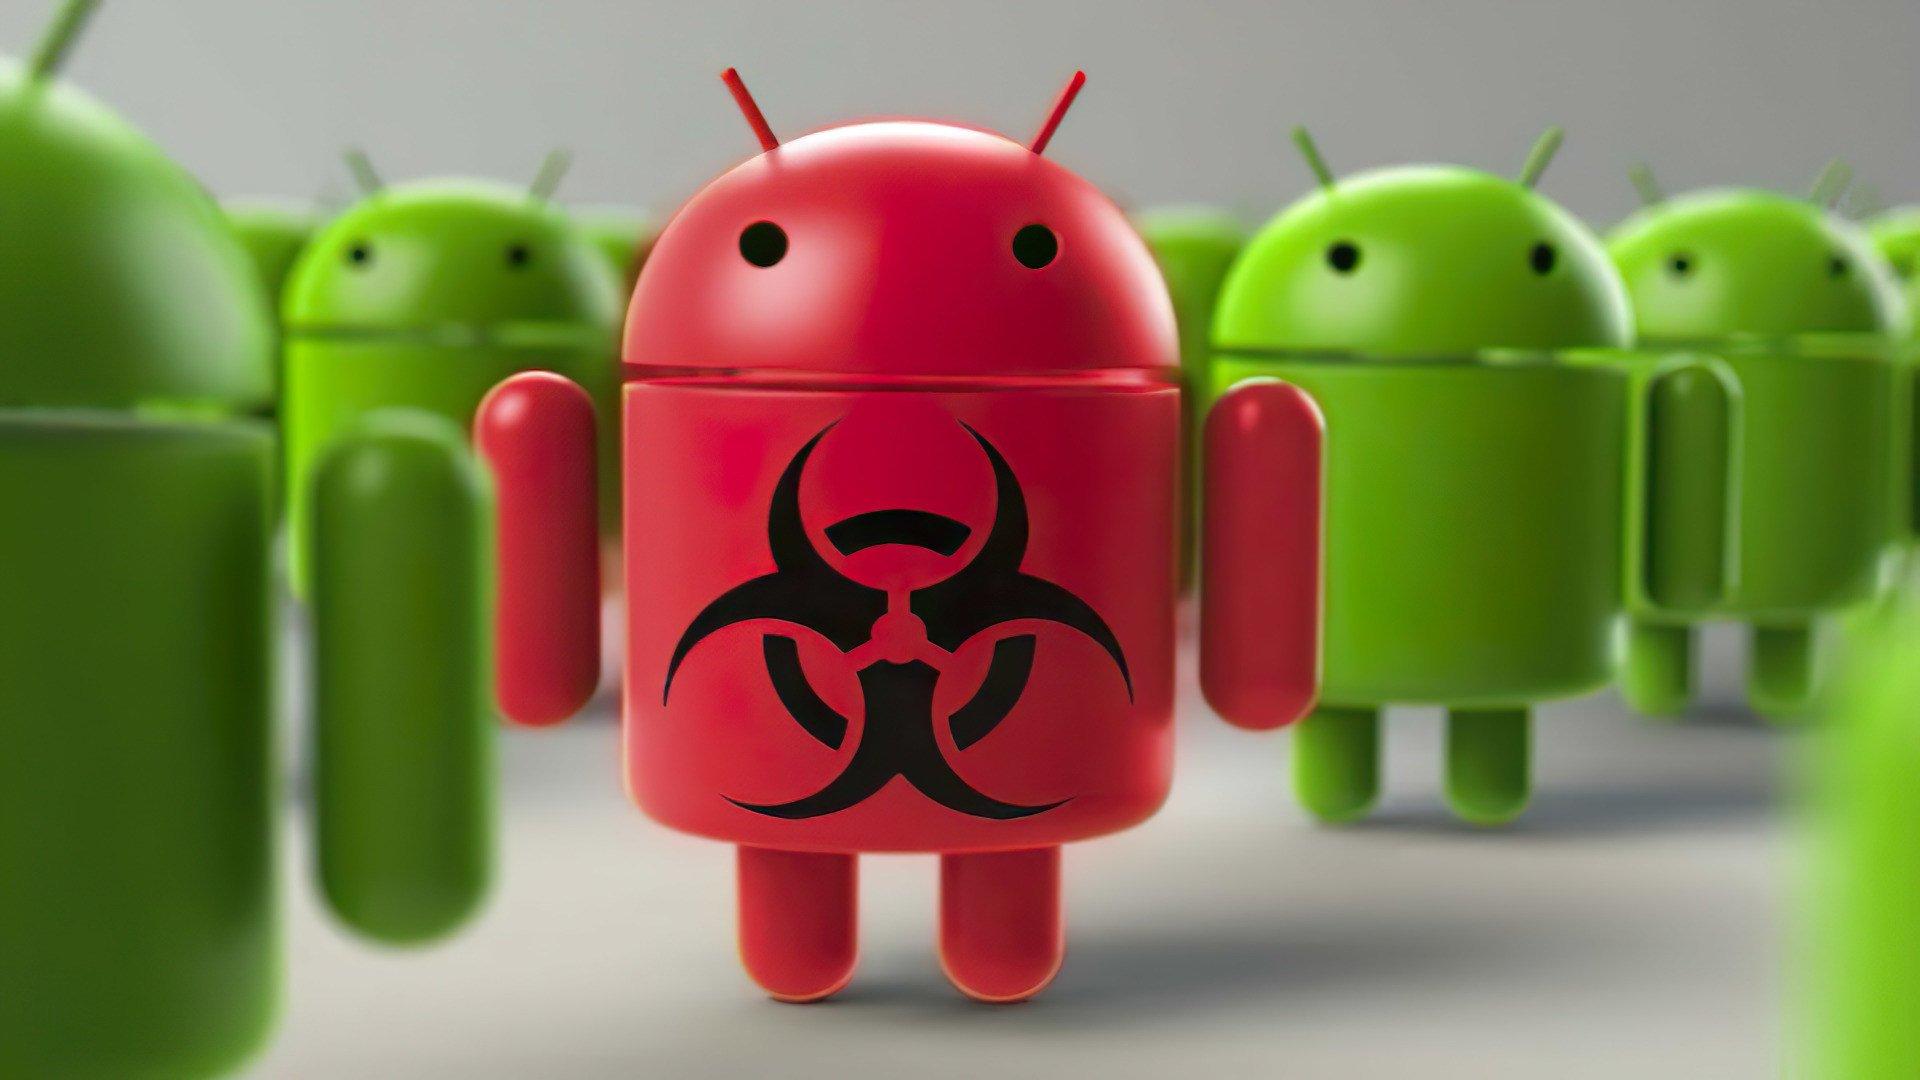 Google, Android, Hacker, Security, Malware, Virus, Trojaner, Schadsoftware, Adware